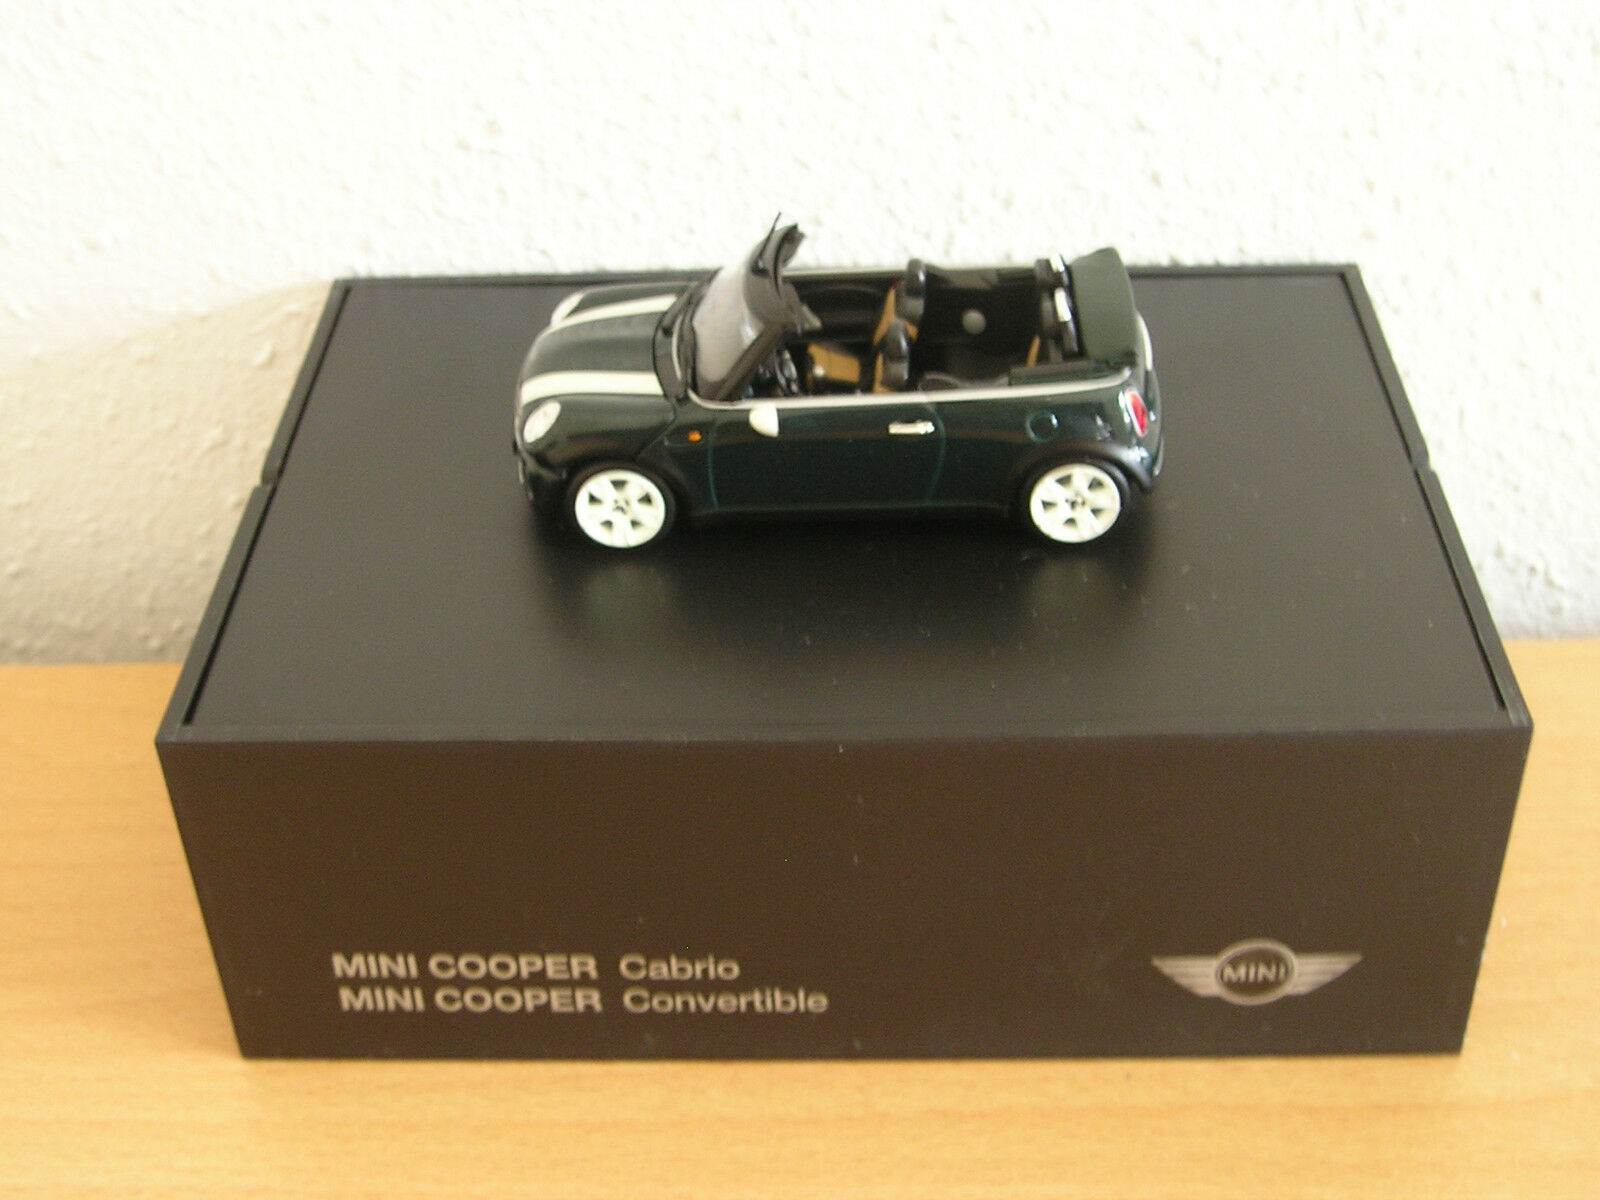 12 Modèle Voitures Mini Cooper Cabriolet r52 British Racing vert (vert), M 1 43